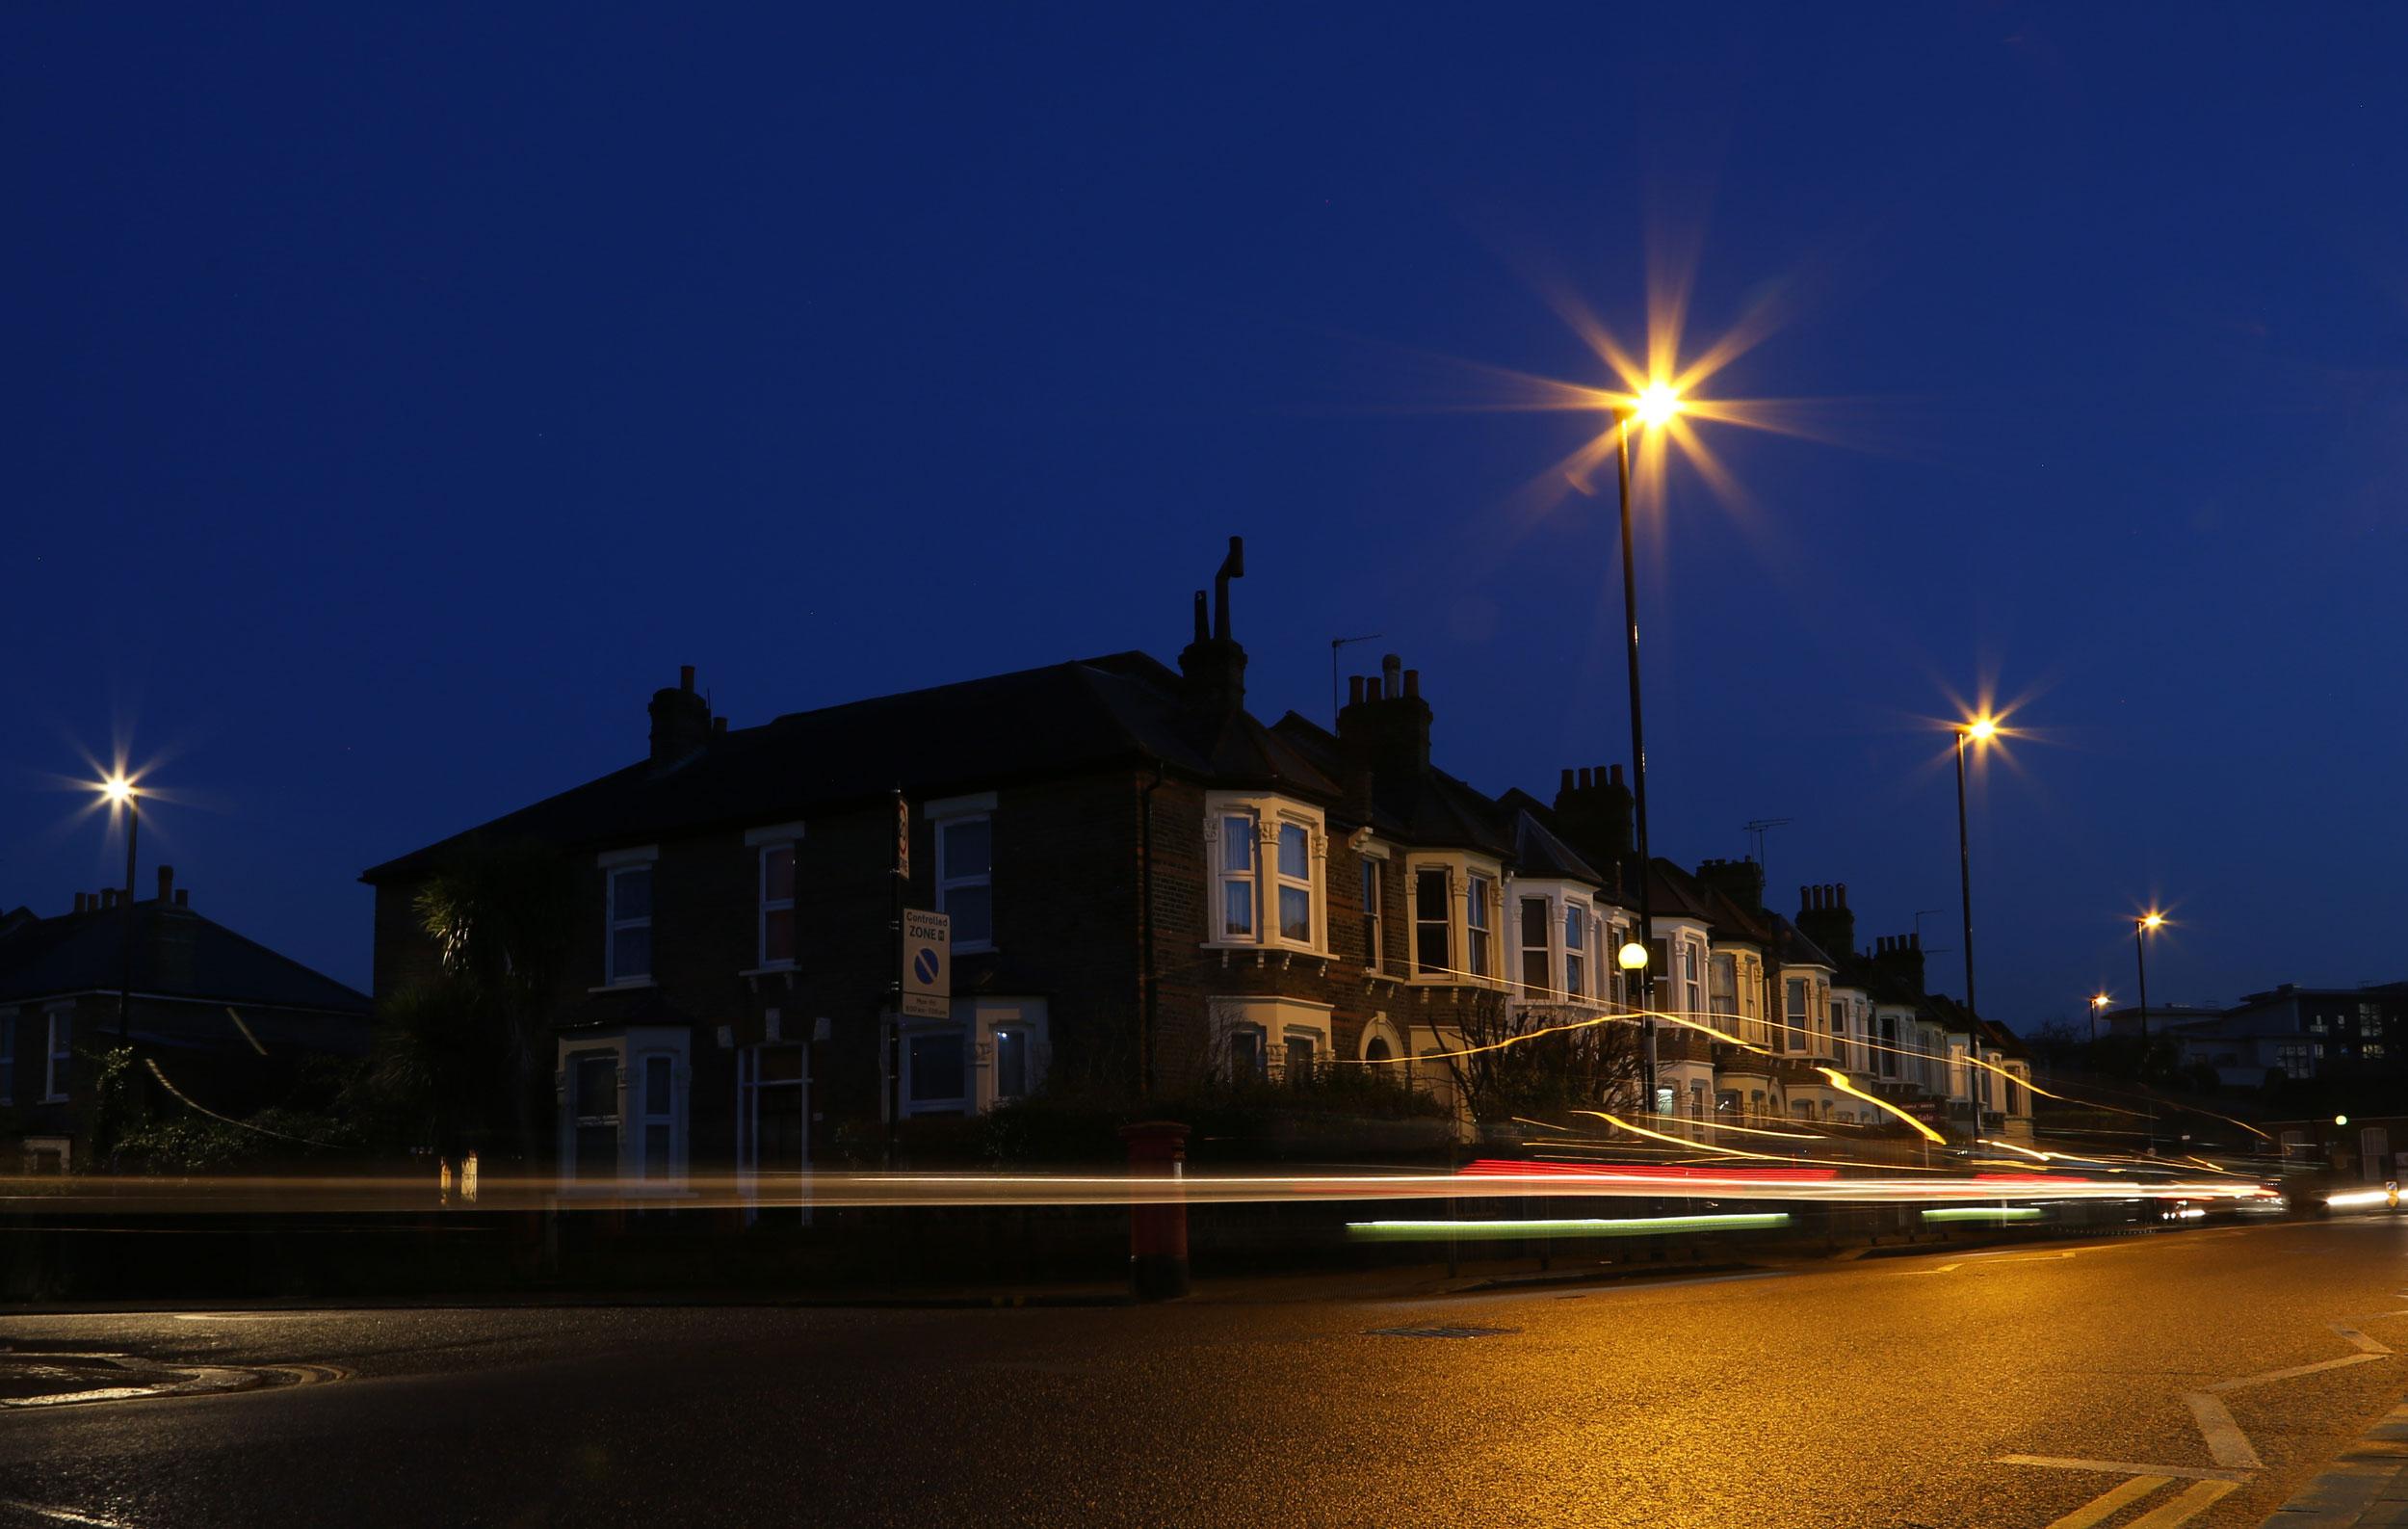 Urban-Hither-Street-5pm.jpg